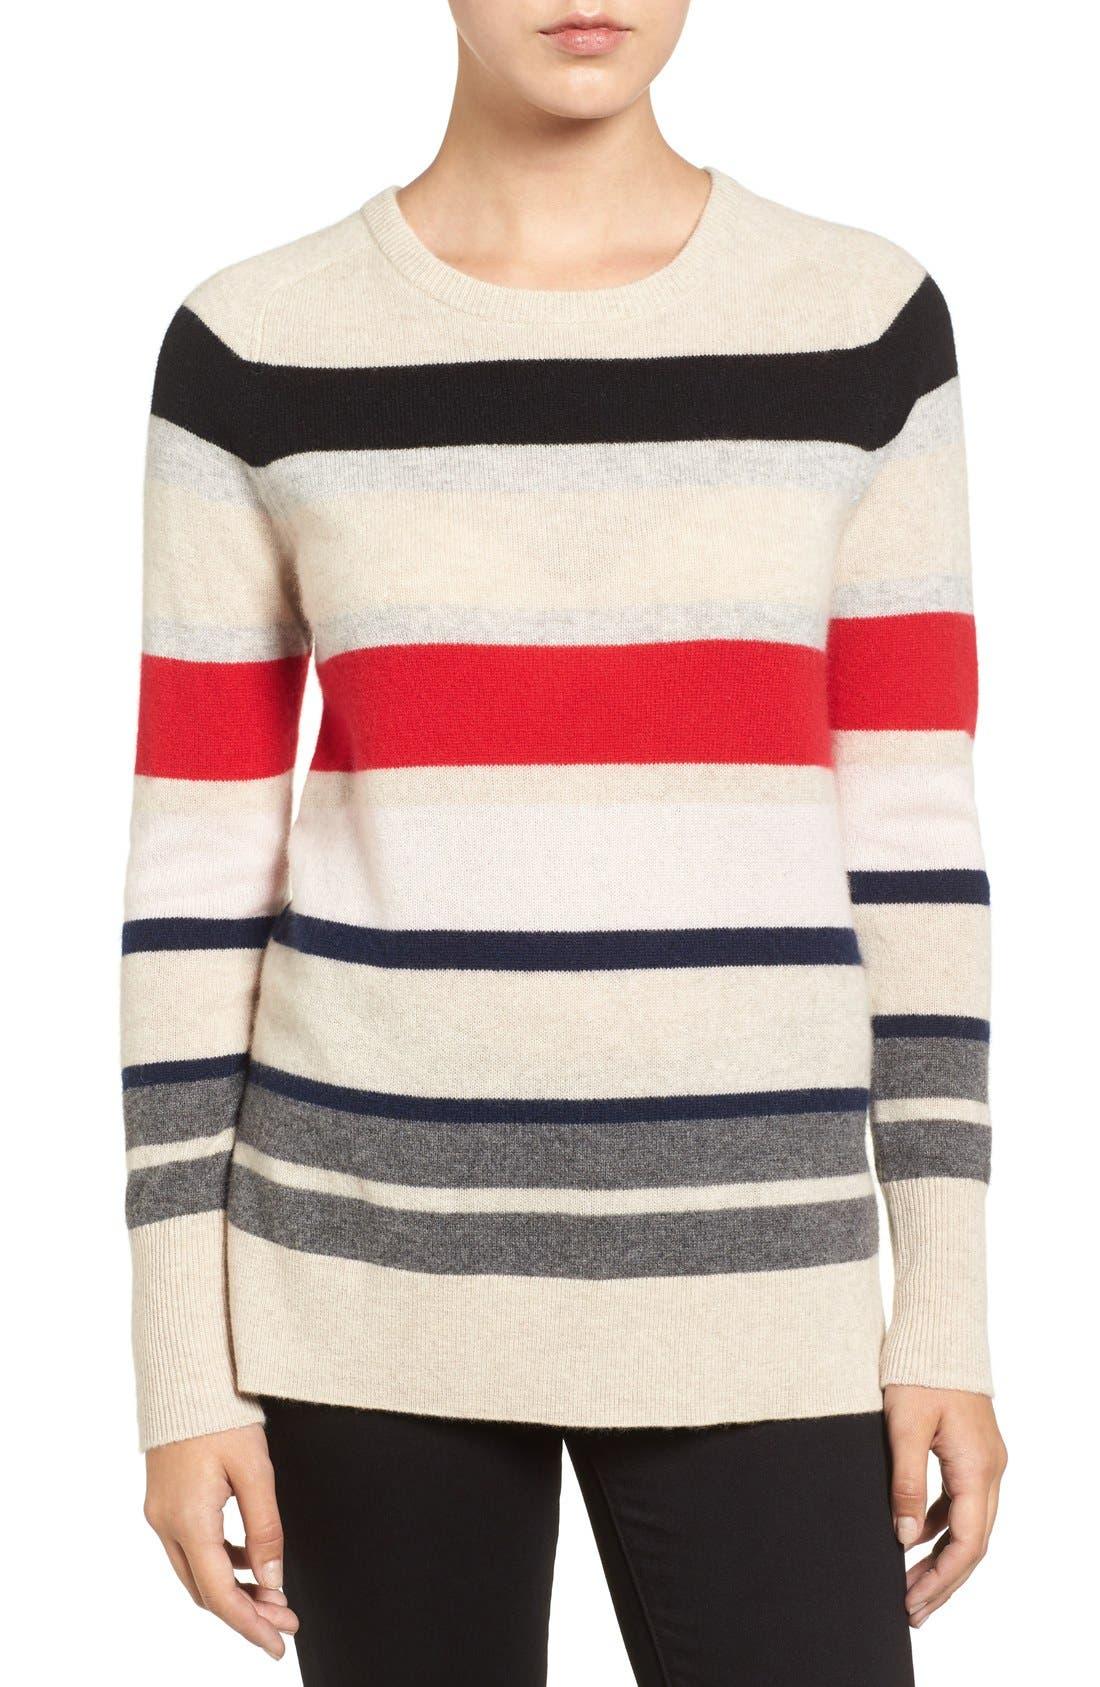 Alternate Image 1 Selected - Halogen® Patterned Cashmere Sweater (Regular & Petite)